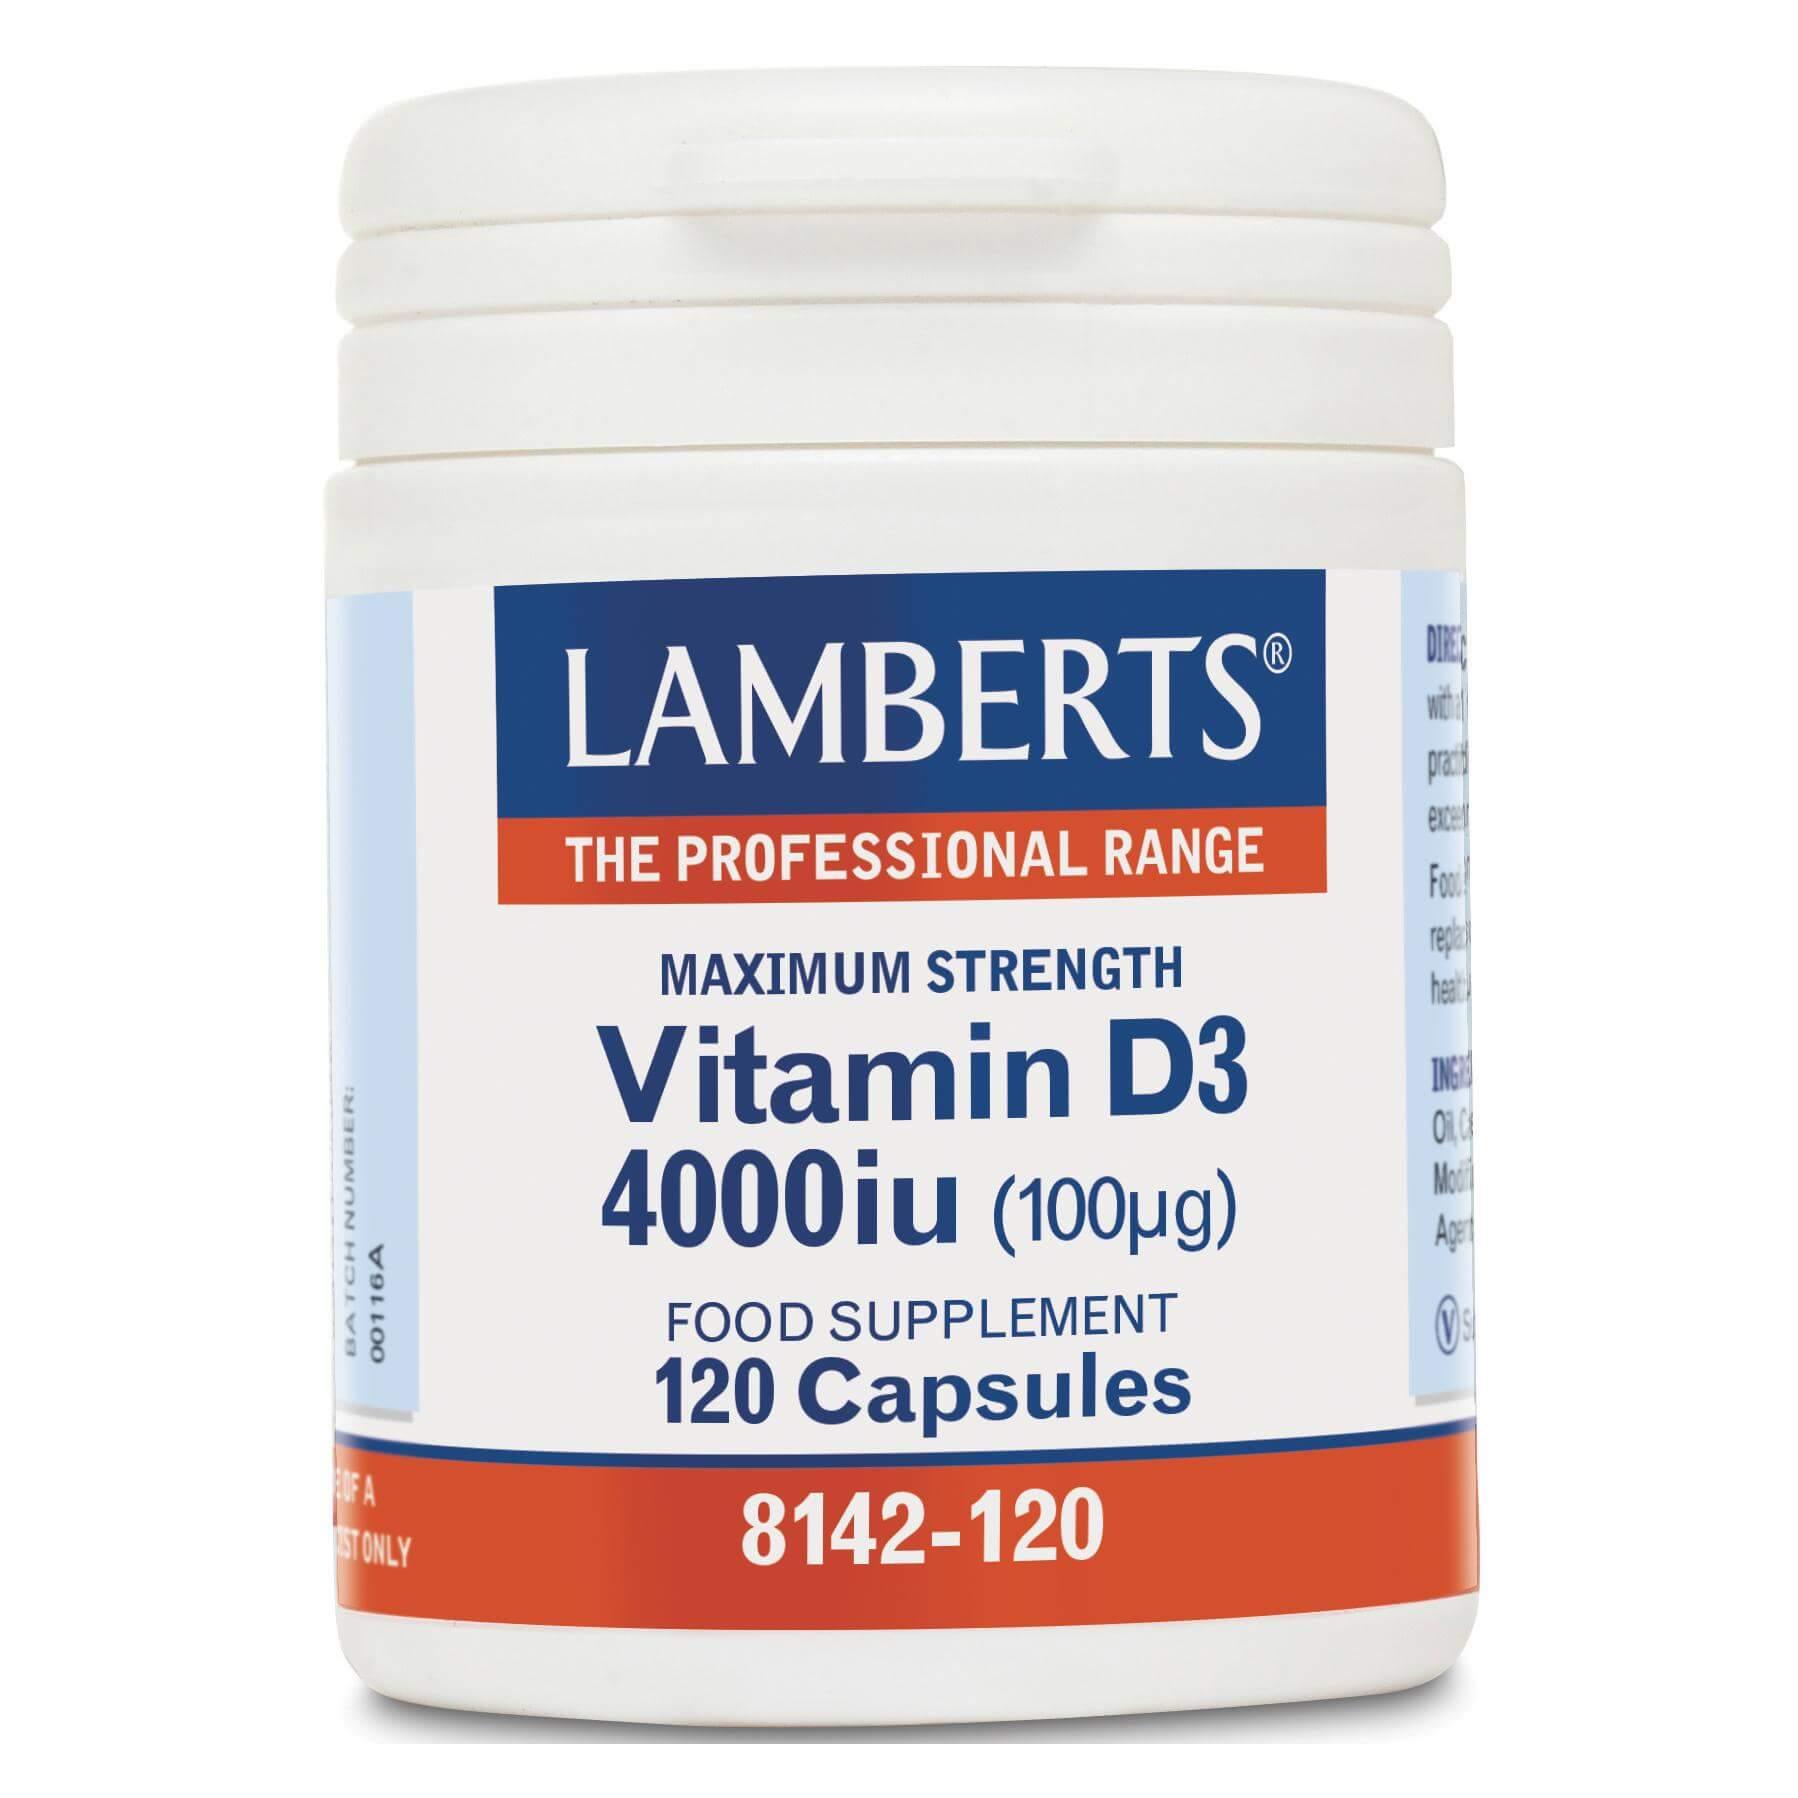 Lamberts Vitamin D3 Συμπλήρωμα Διατροφής γιατη Διόρθωση των Ανεπαρκειών της Βιταμίνης D4000iu 100μg 120tabs